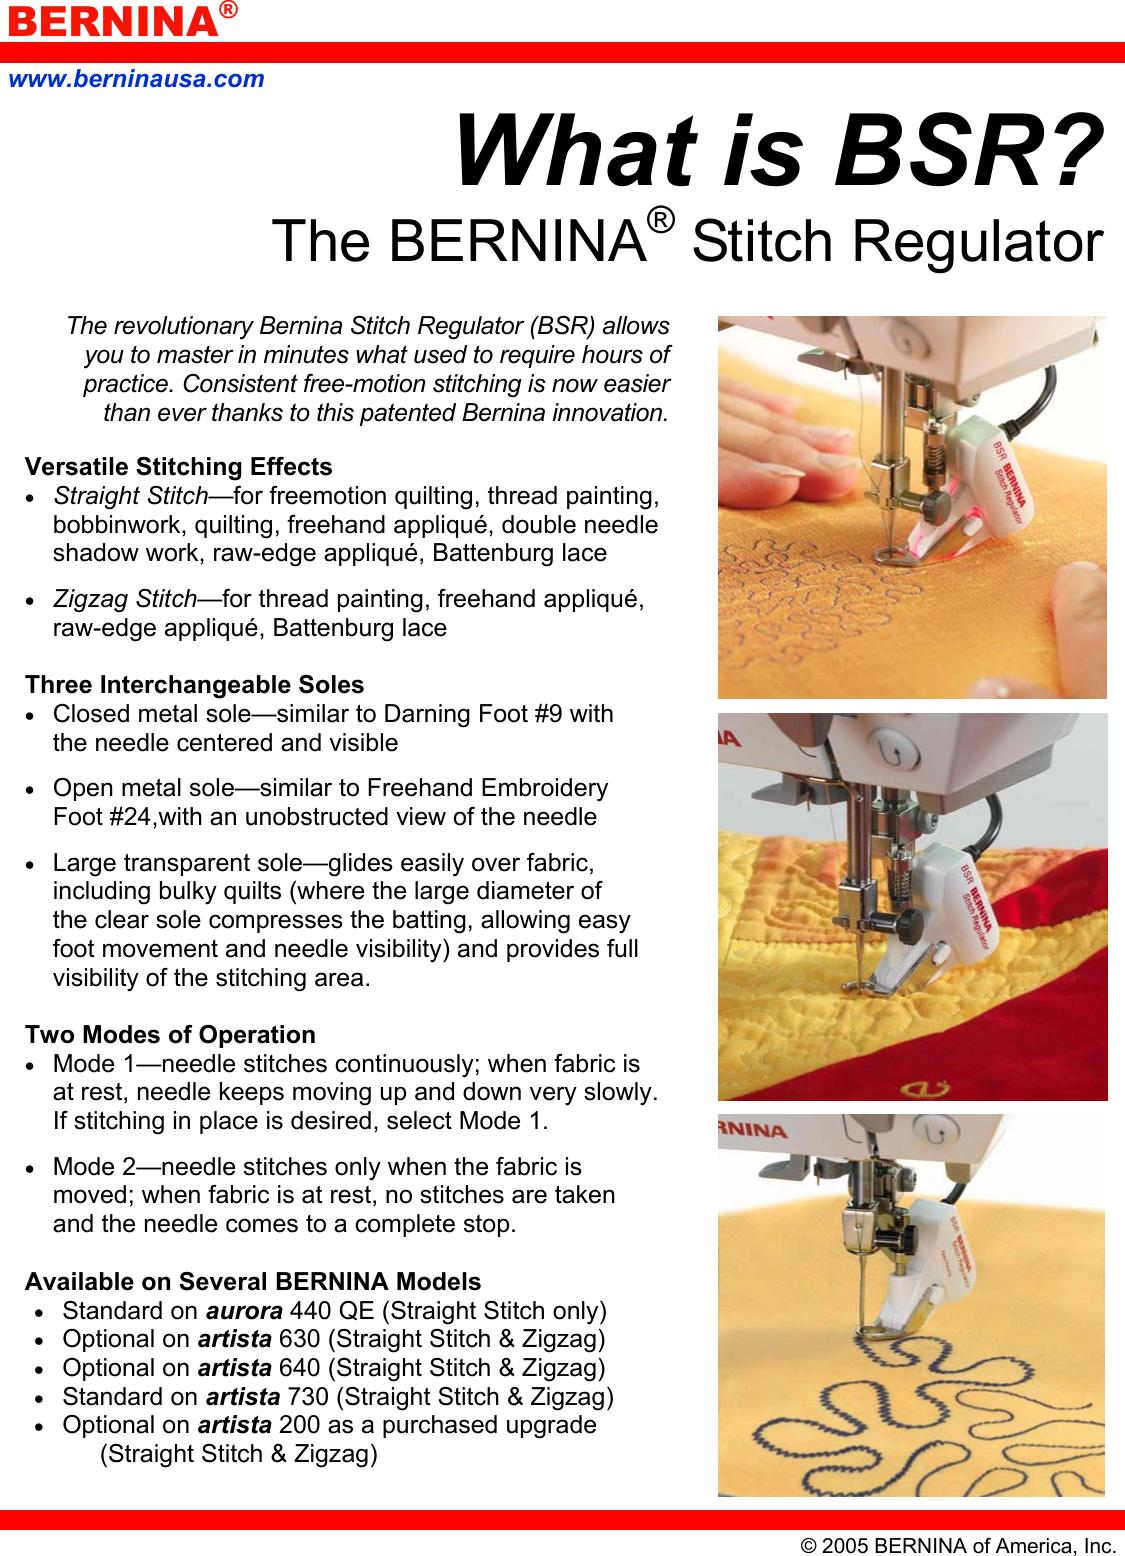 Bernina Stitch Regulator Users Manual What Is BSR